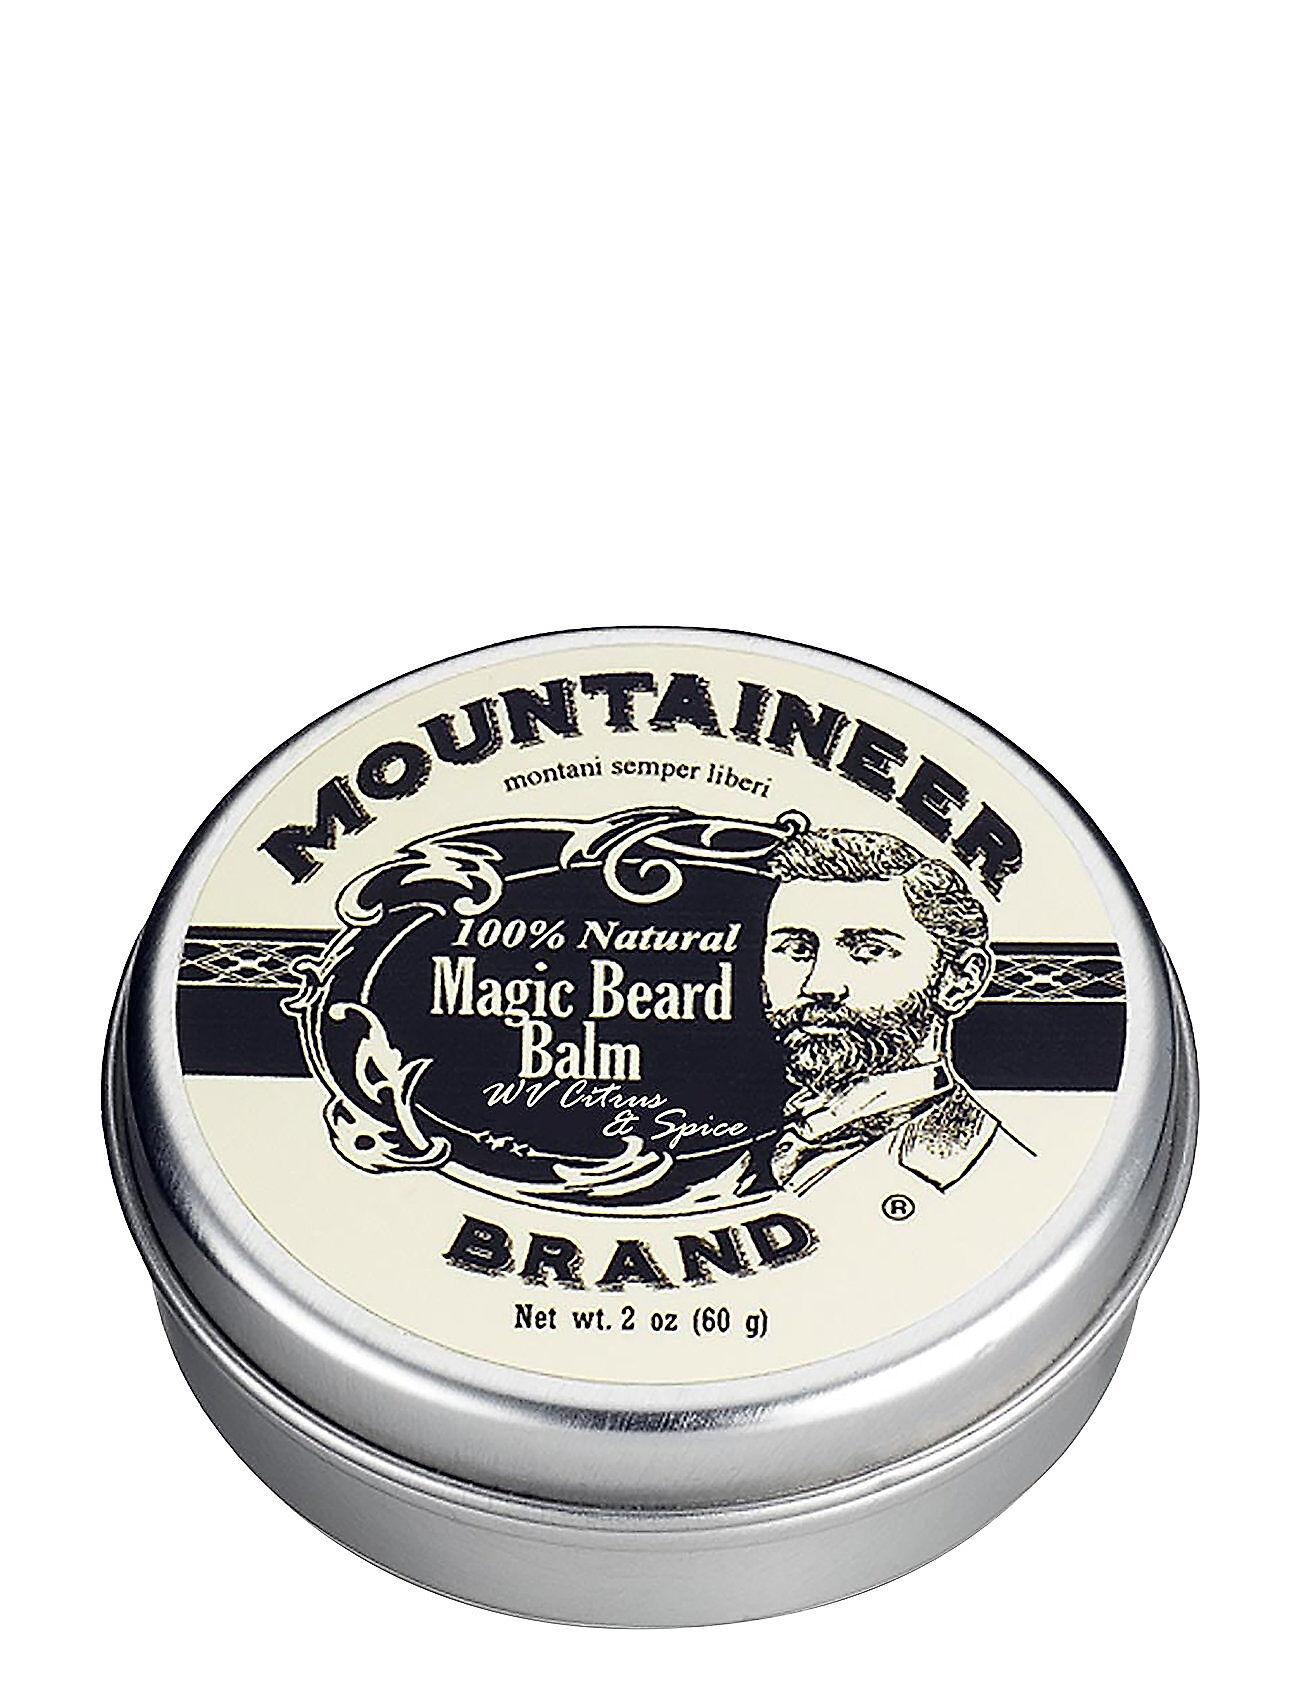 Mountaineer Brand Citrus & Spice Beard Balm